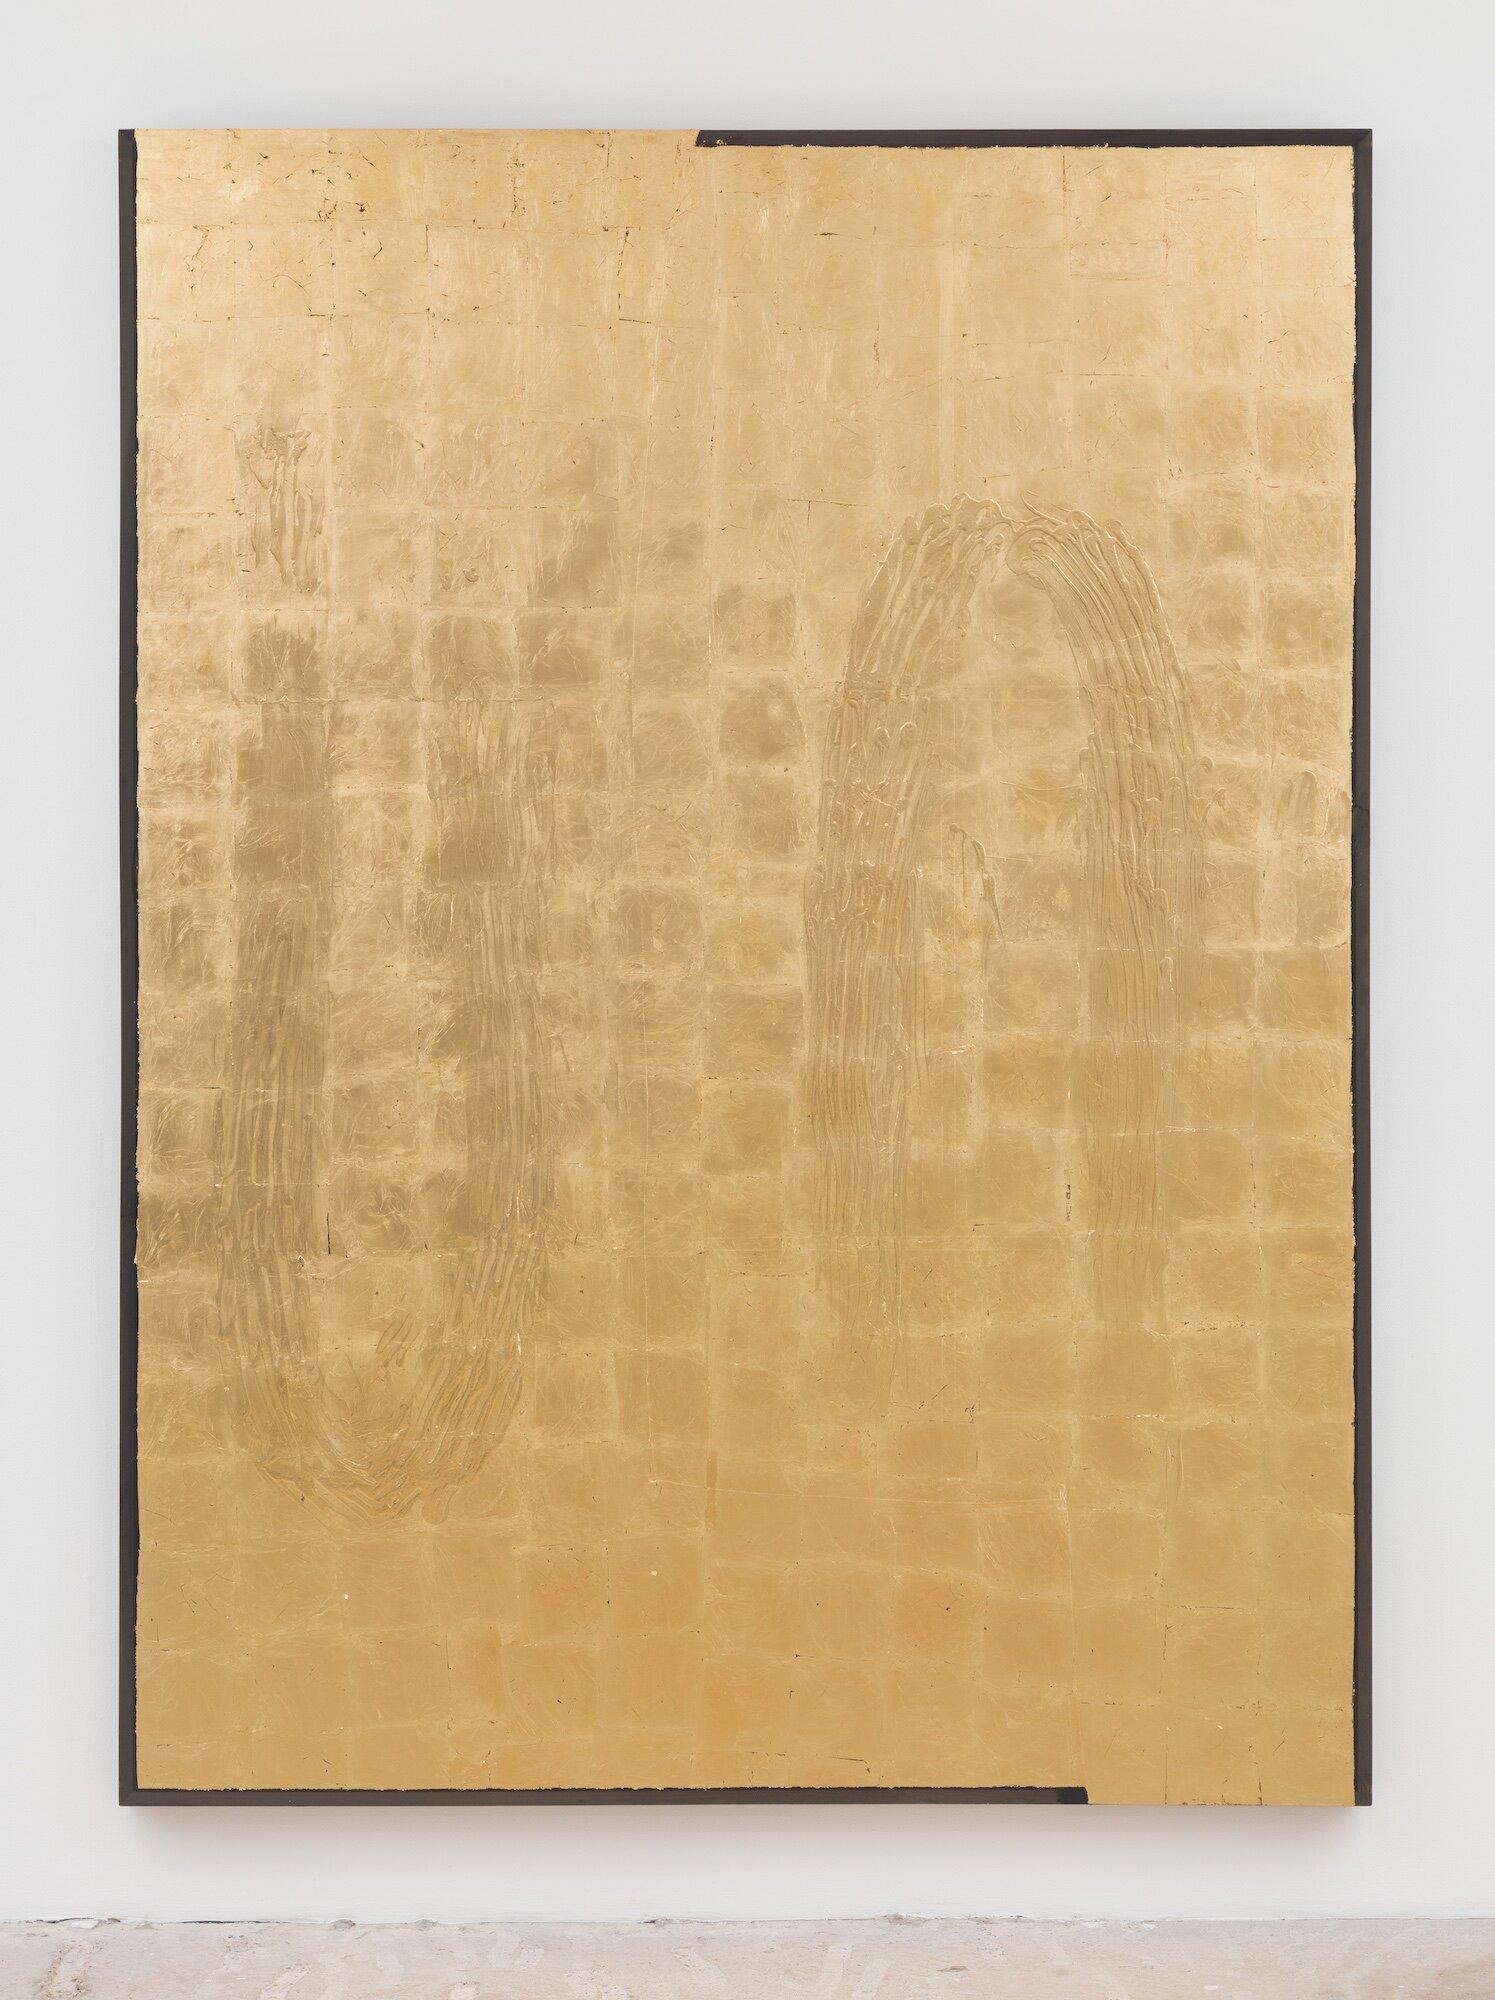 Gilded (Flipped Visions) , 2019 Acrylic medium on fabric, gold leaf, poplar 94 x 70 x 2.5 inches